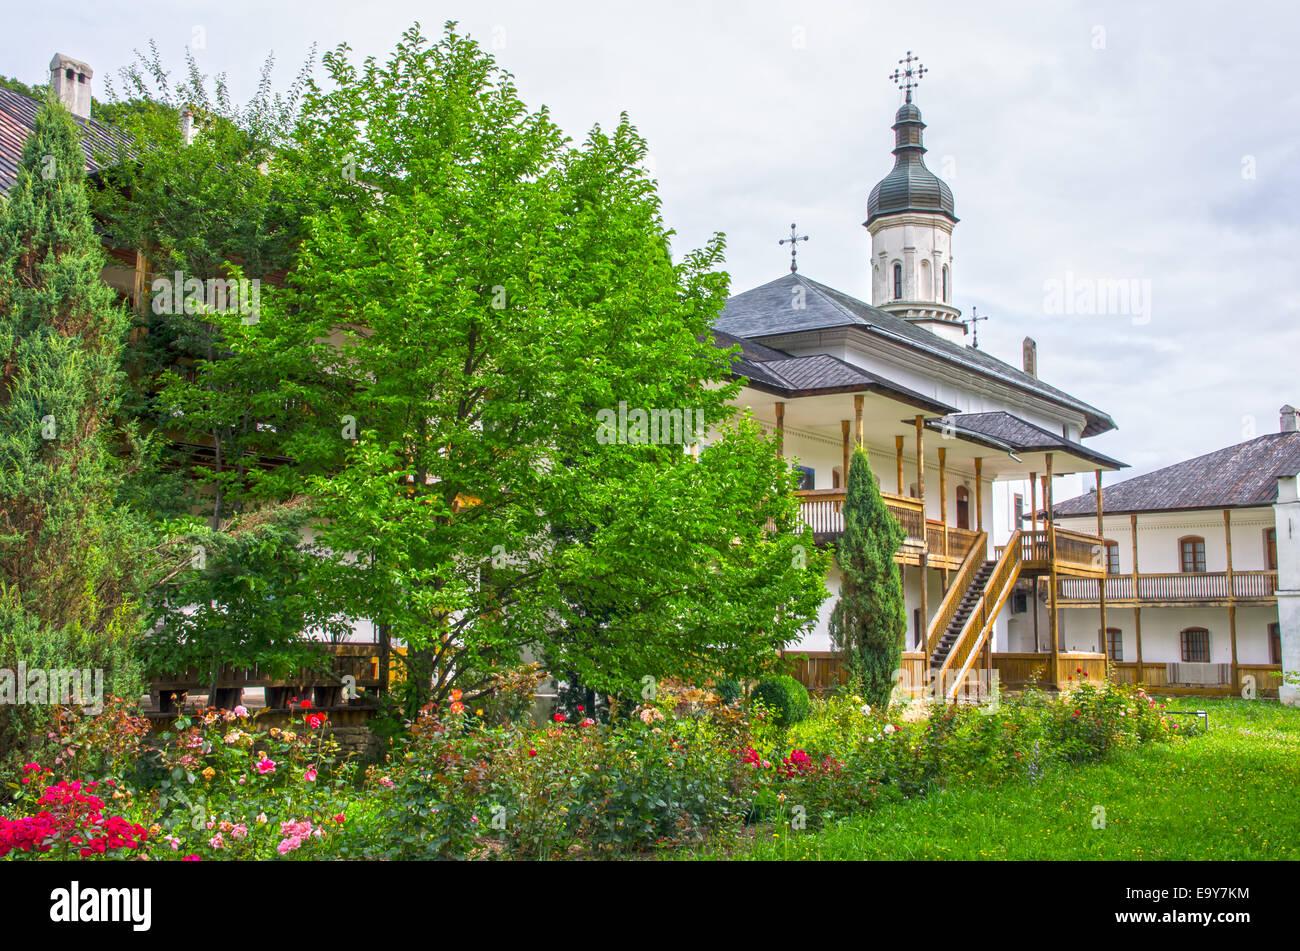 Orthodox monastery of Secu in Moldavia, Romania. - Stock Image